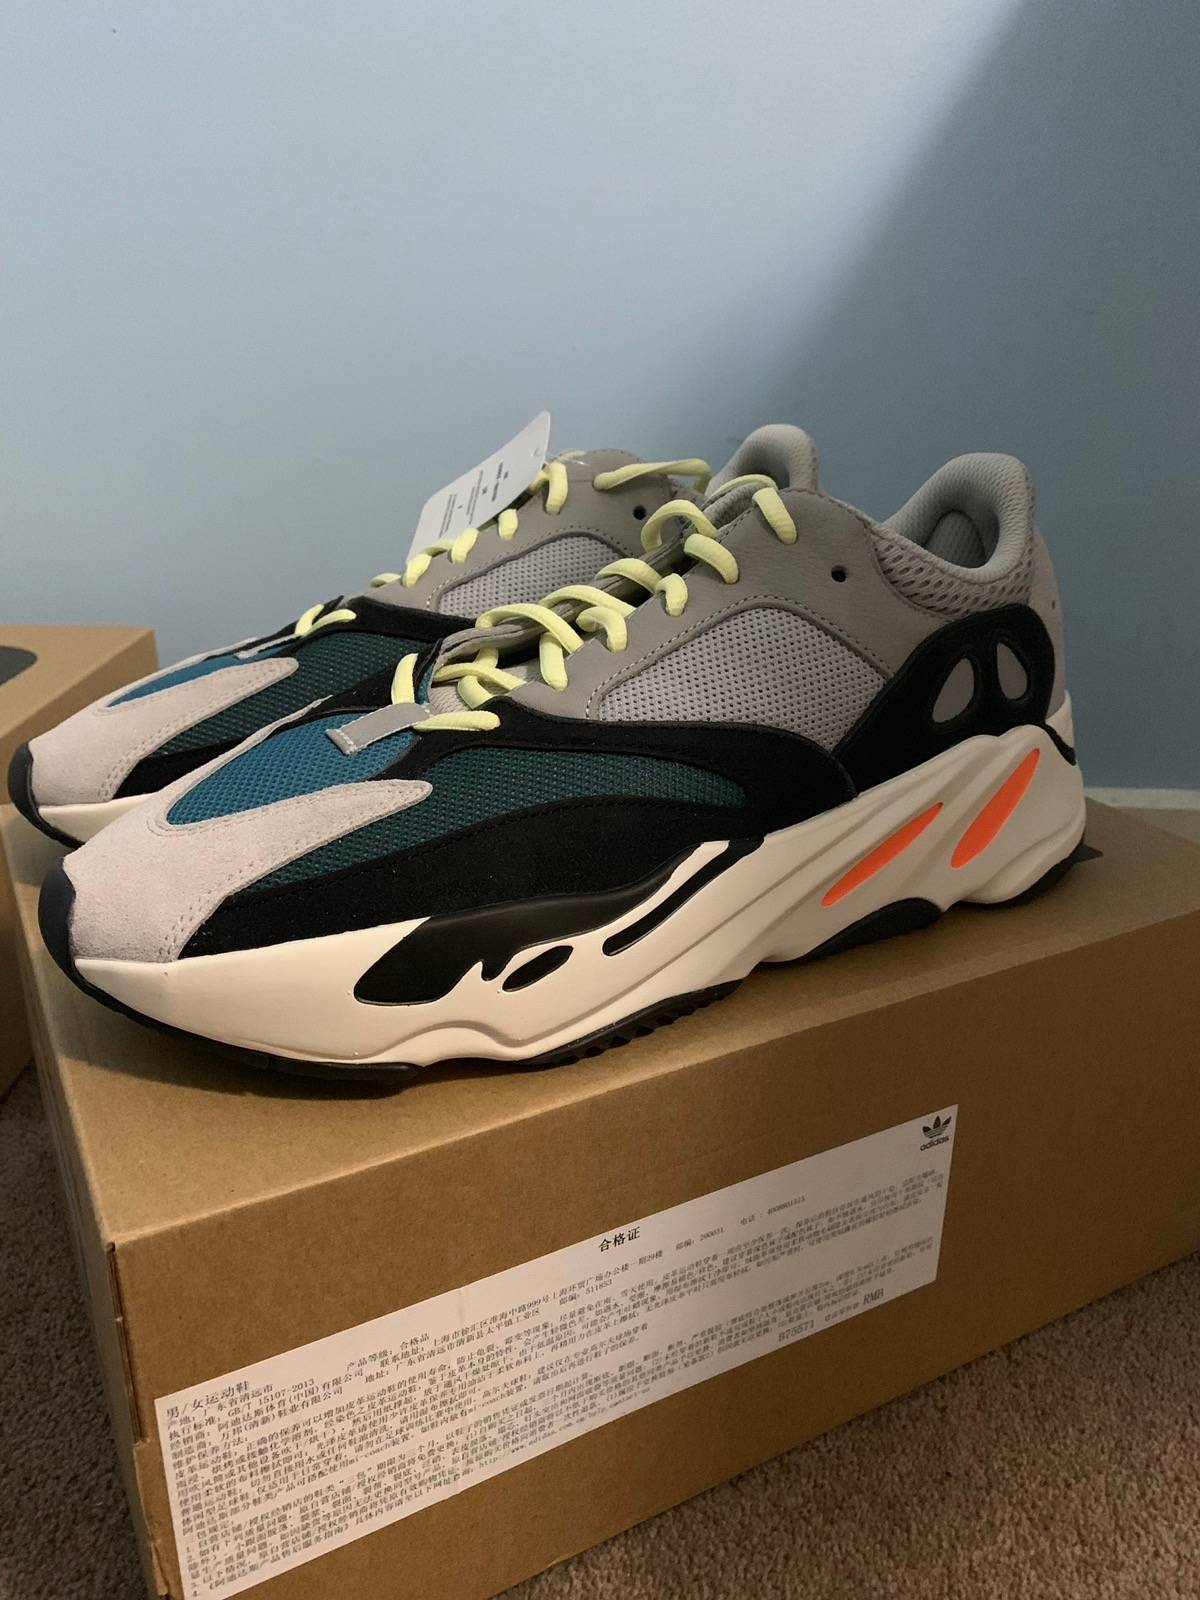 4c494f7fc5d88 Adidas Kanye West × Yeezy Boost × Yeezy Season. Wave Runner 700 OG. Size  US  12   EU 45